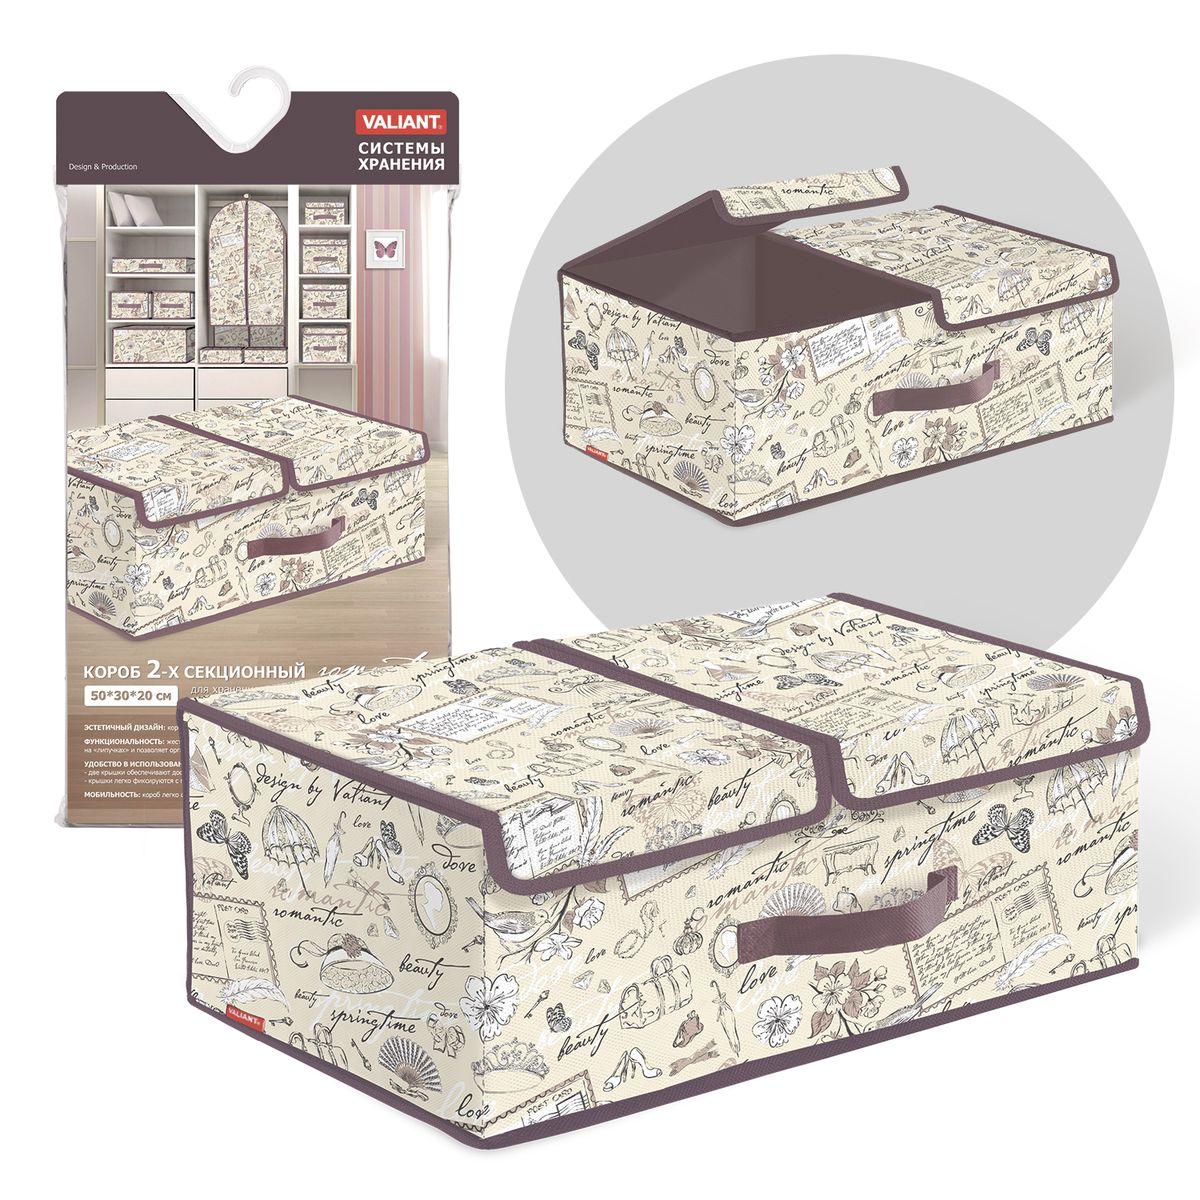 Короб стеллажный Valiant Romantic, двухсекционный, 50 х 30 х 20 смRM-BOX-L2